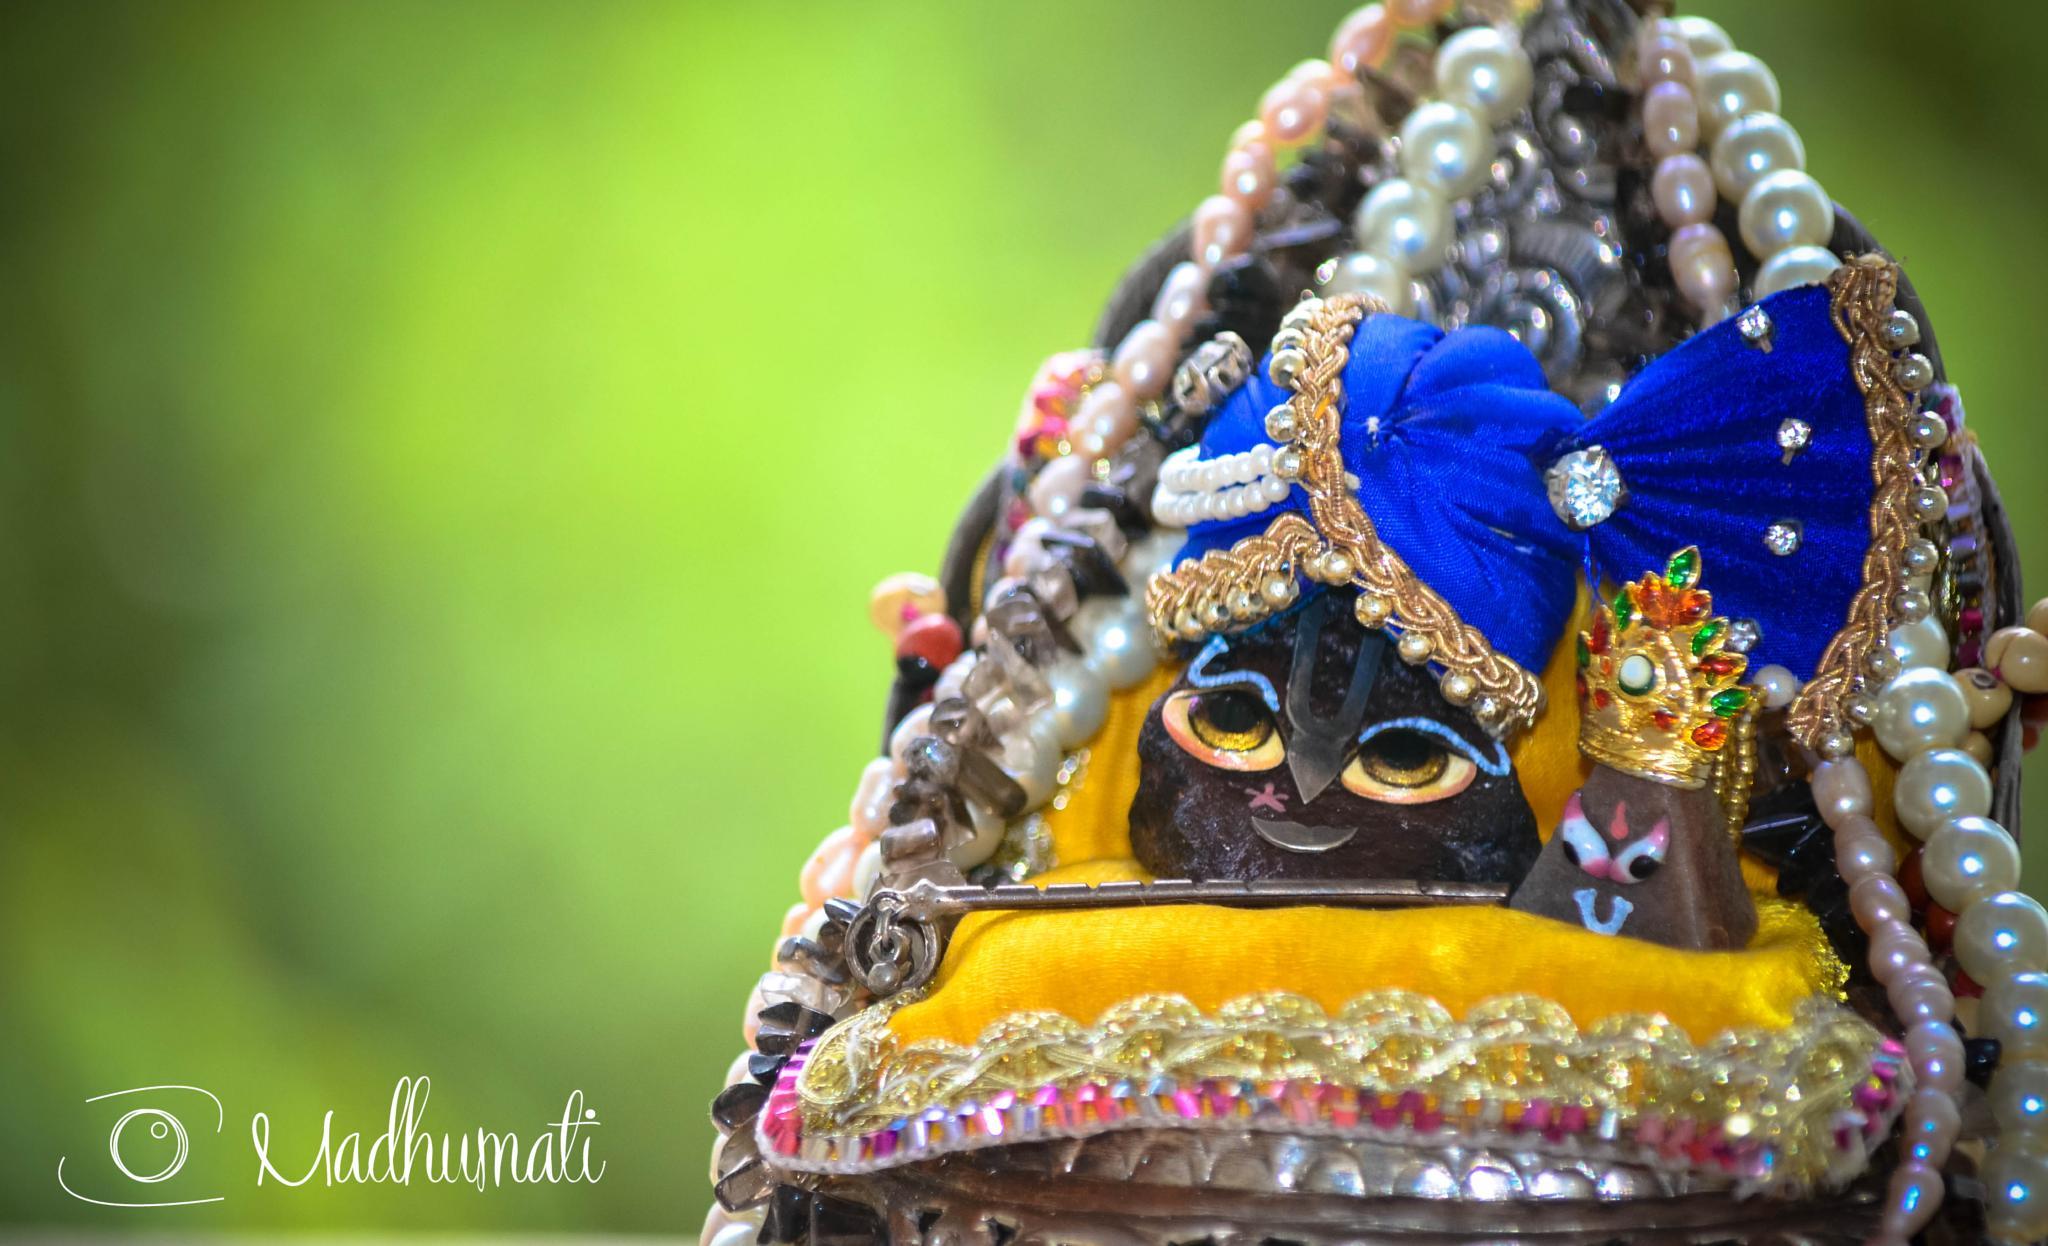 Govardhana by madhumati